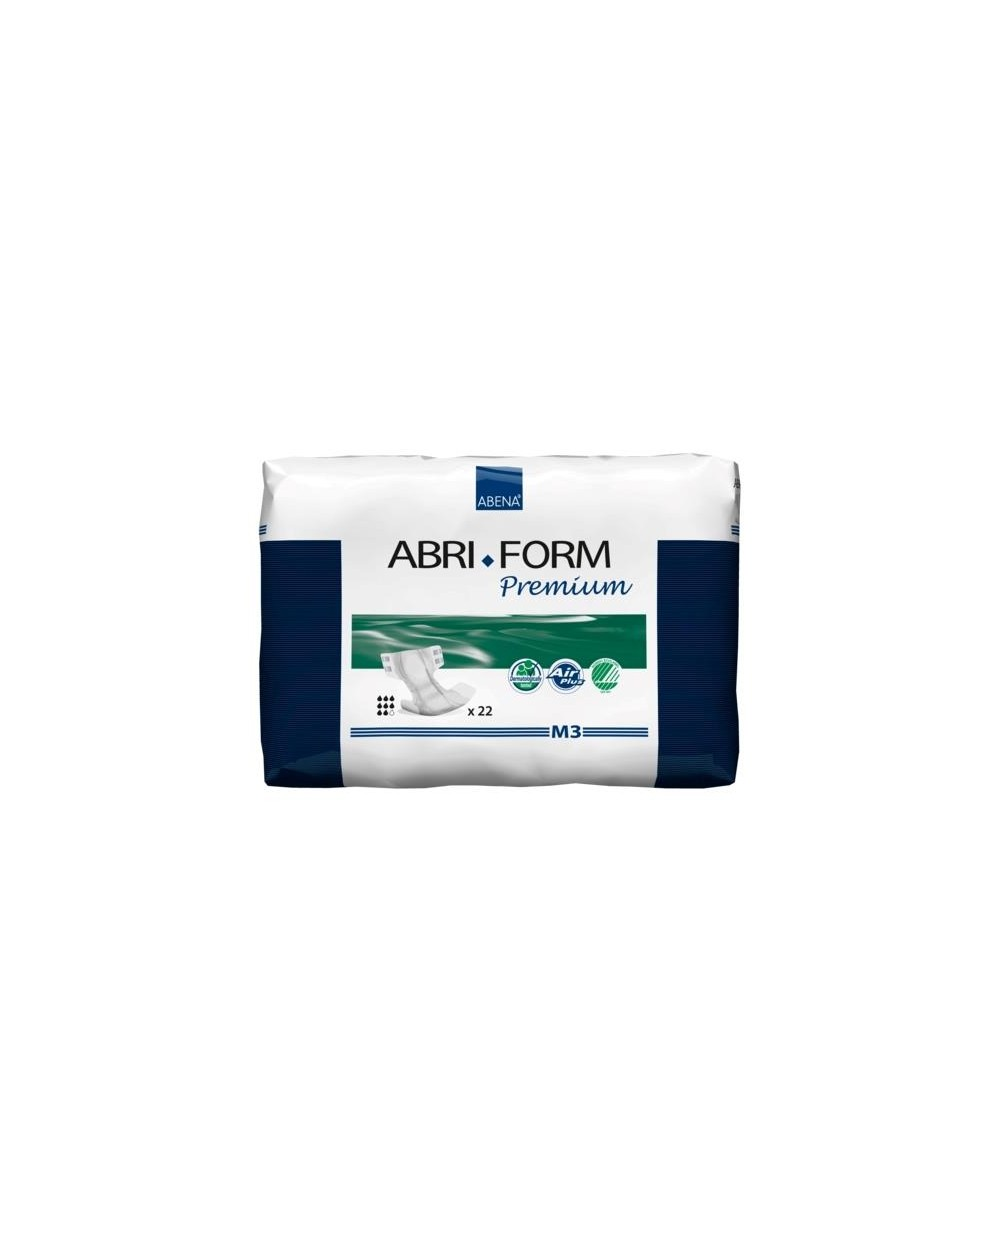 Abena Abri-Form 3 Medium - 22 protections